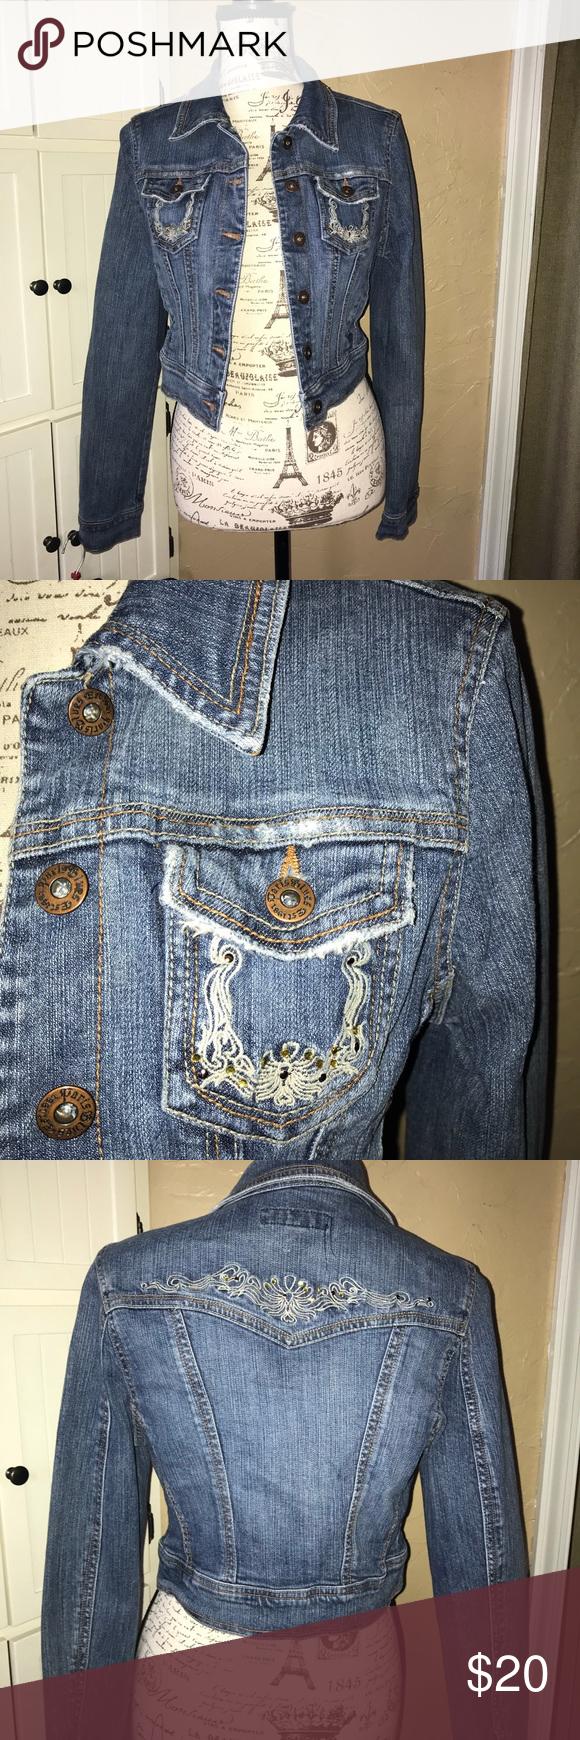 Paris Blues Jean Jacket Euc Jean Jacket I Have A Pair Of Jeans In My Closet That Match This Paris Blues Jackets Coat Fashion Blue Jean Jacket Clothes Design [ 1740 x 580 Pixel ]